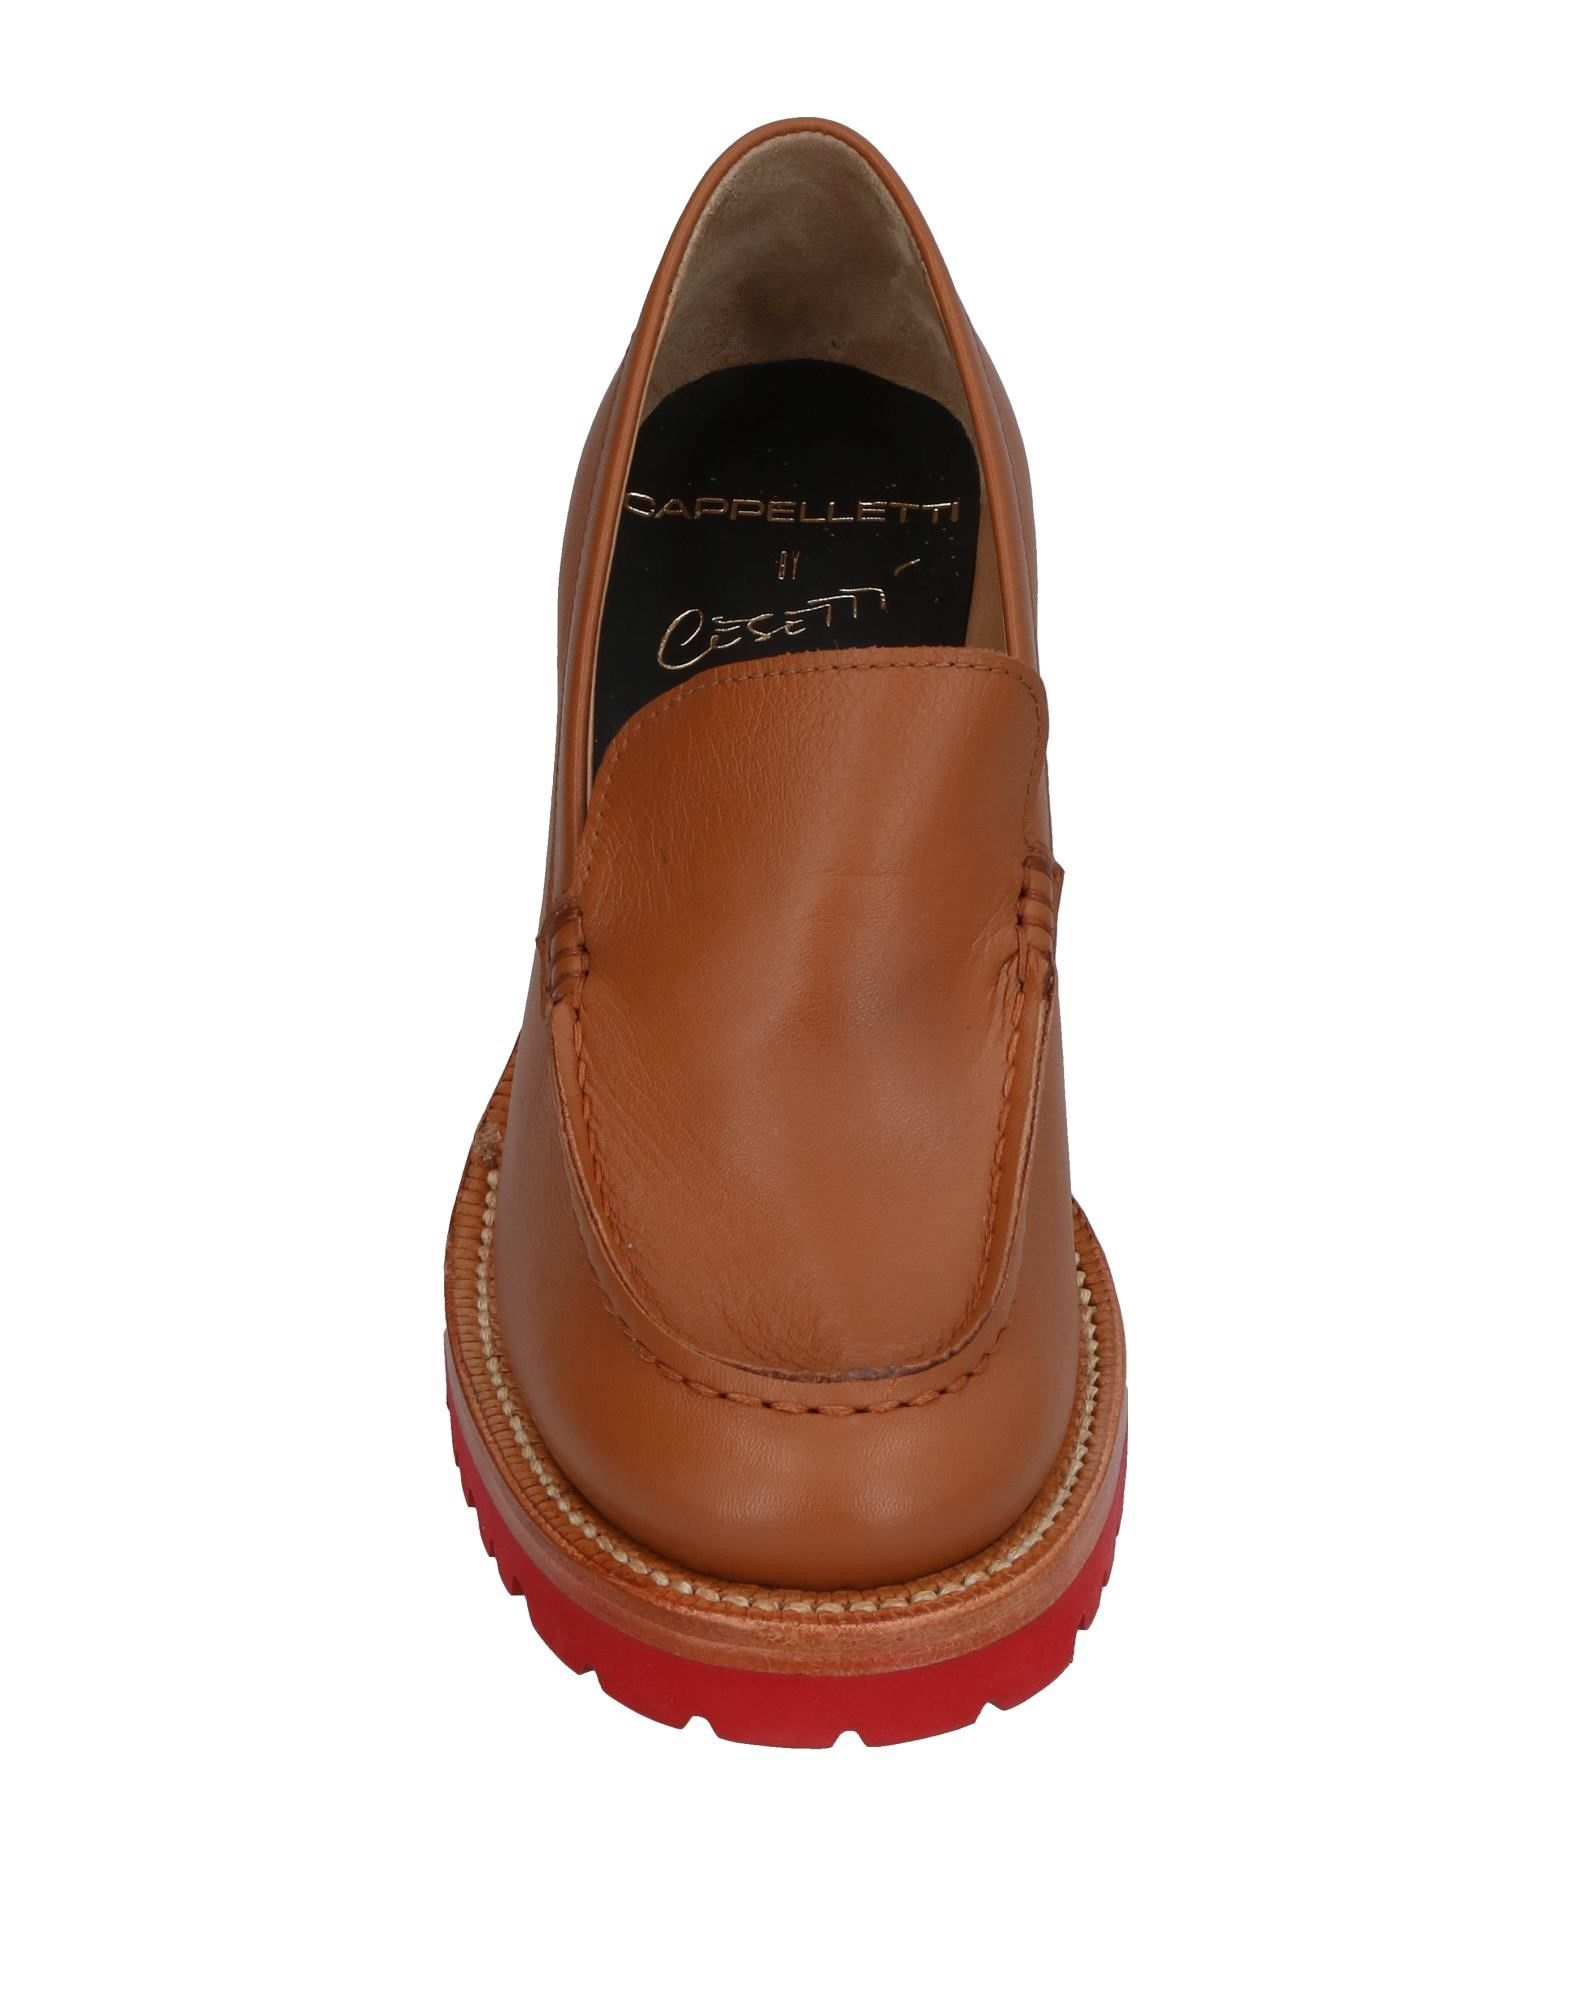 Damen Cappelletti Mokassins Damen   11387741JR Heiße Schuhe cb95ca